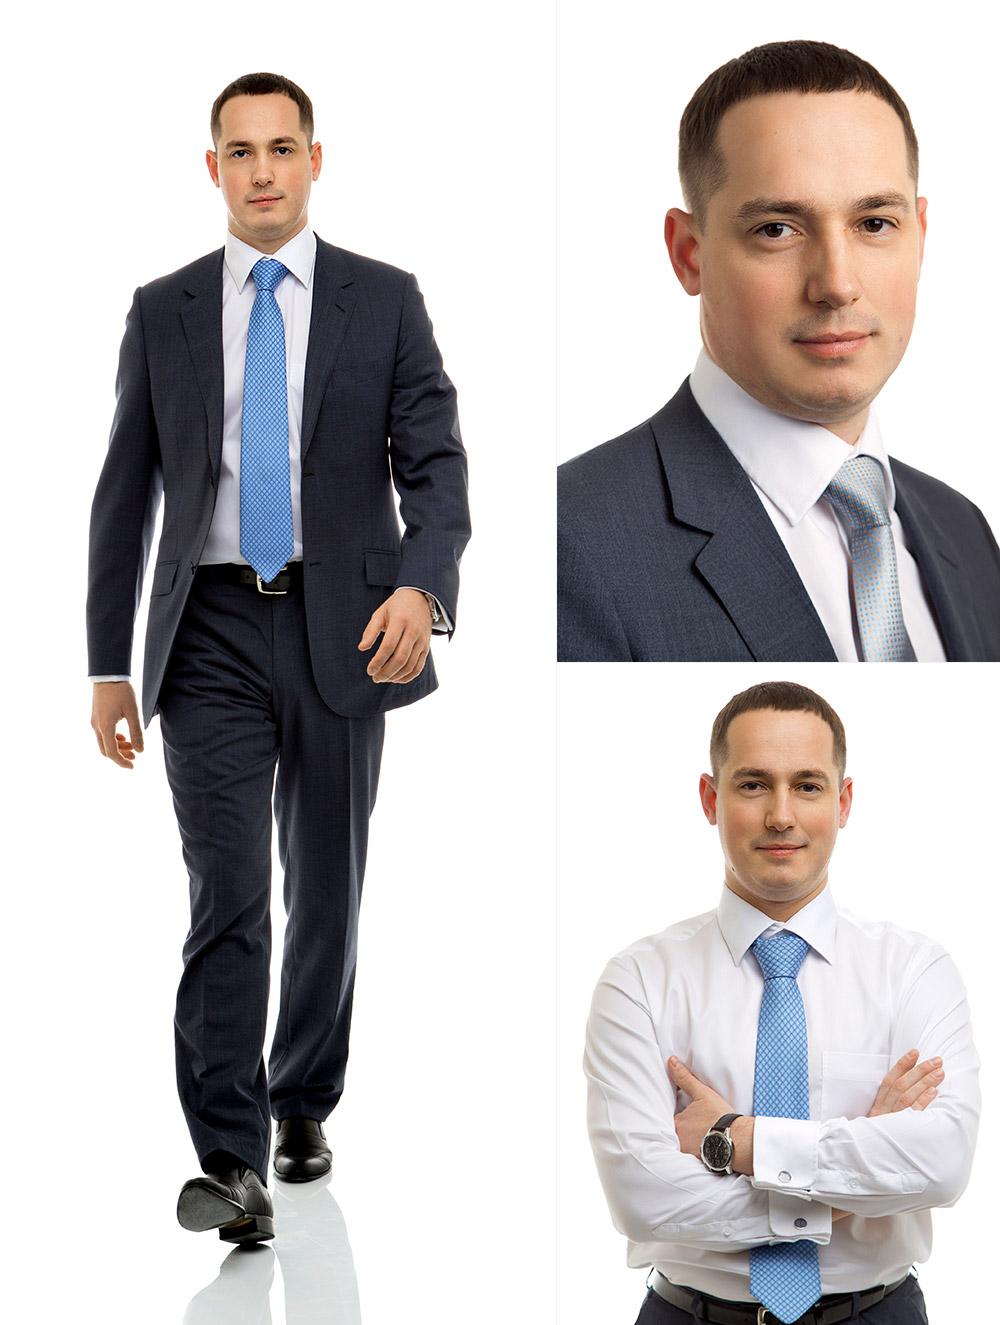 LV5_1847-collage.v2. Бизнес-портрет, фотограф Лена Волкова